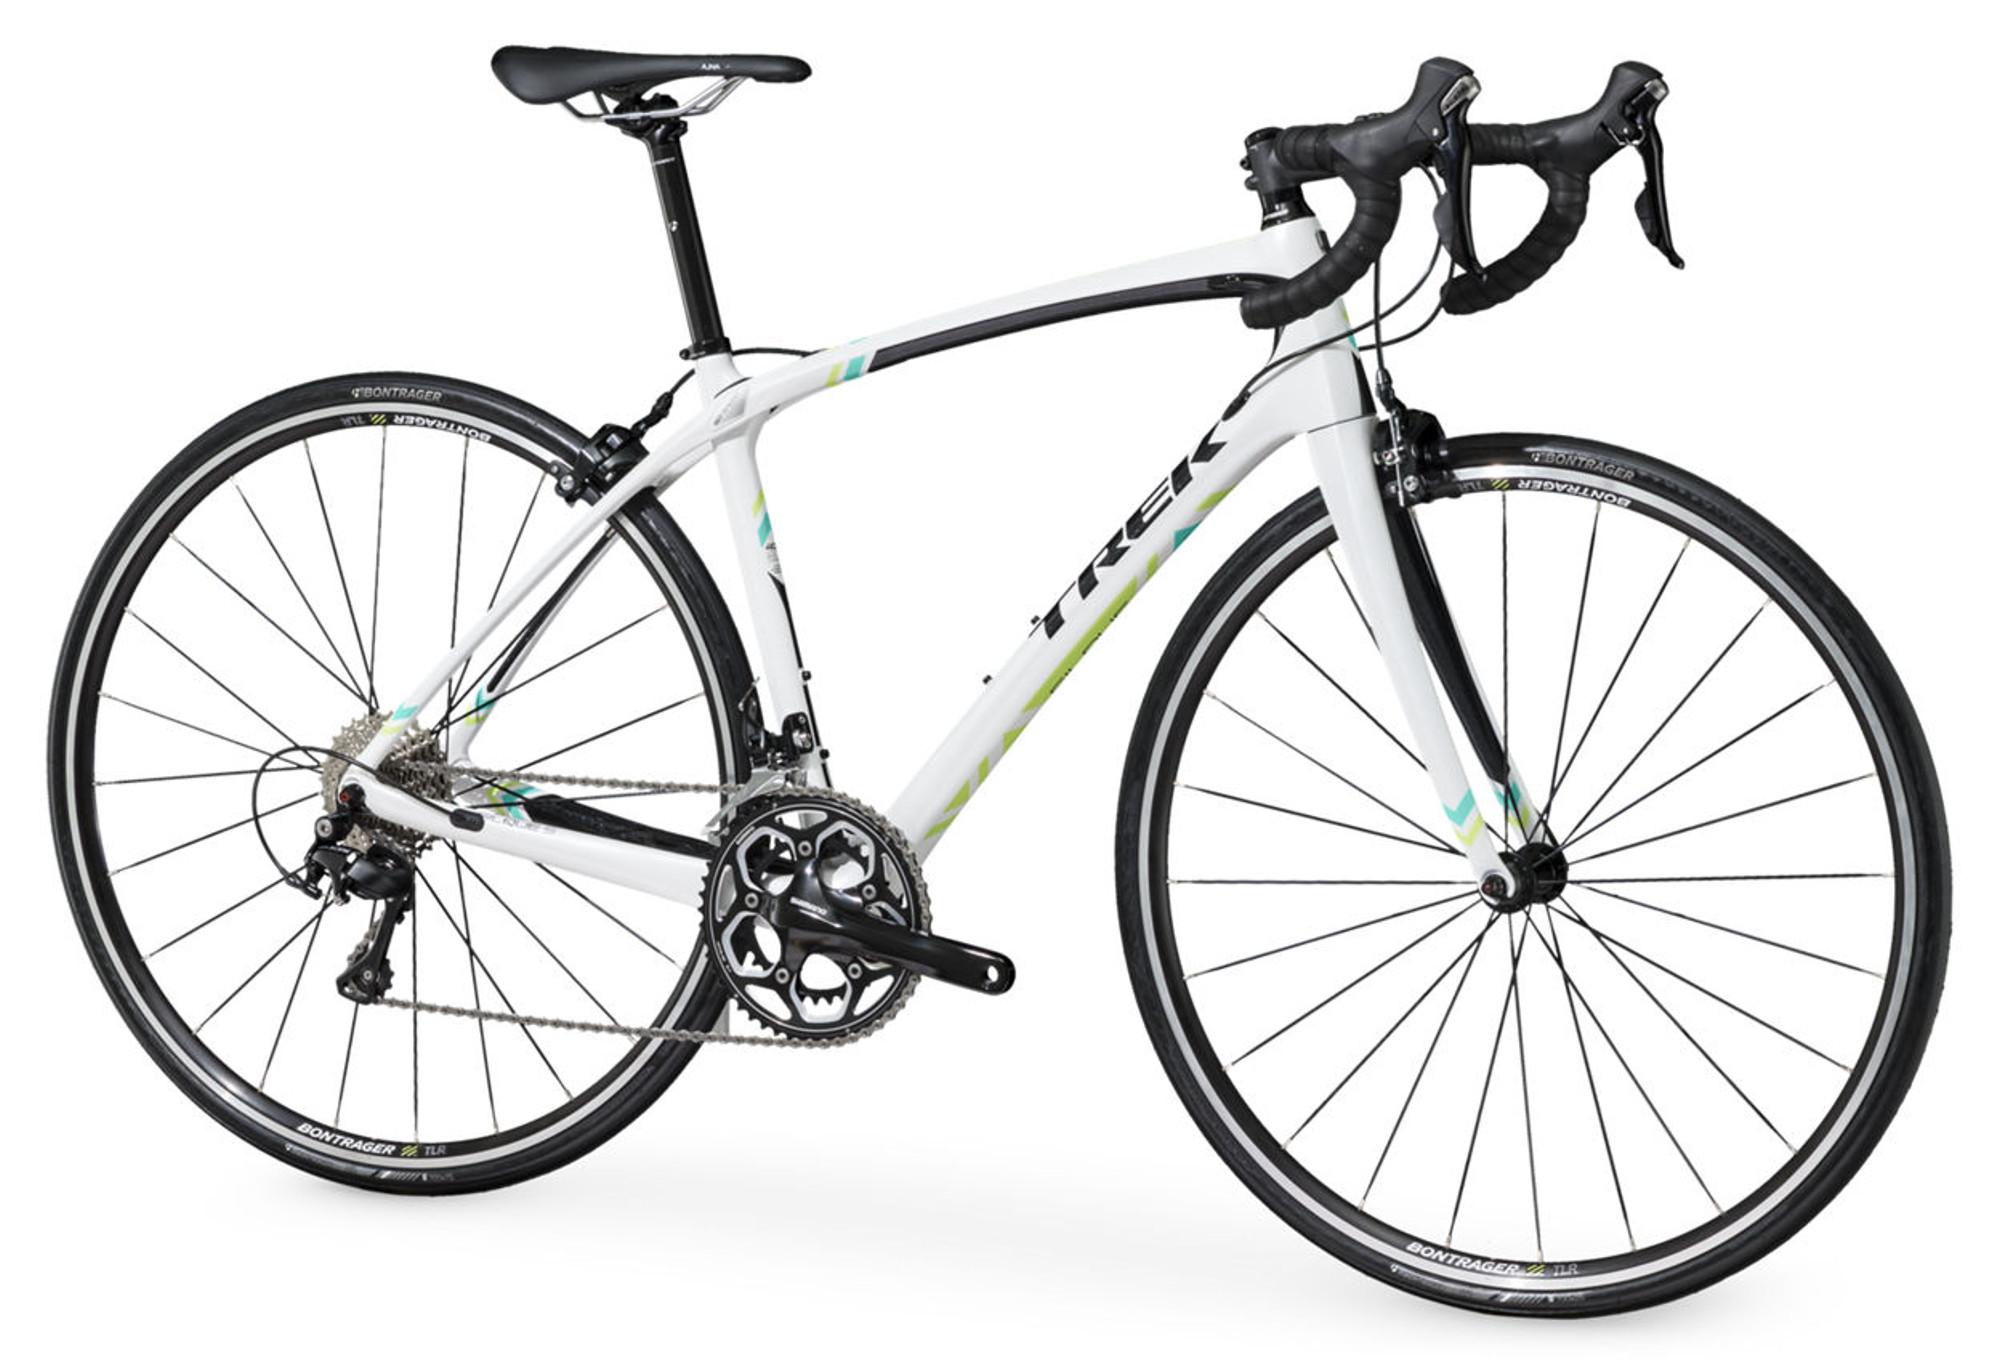 Trek Racing Bike Size Guide